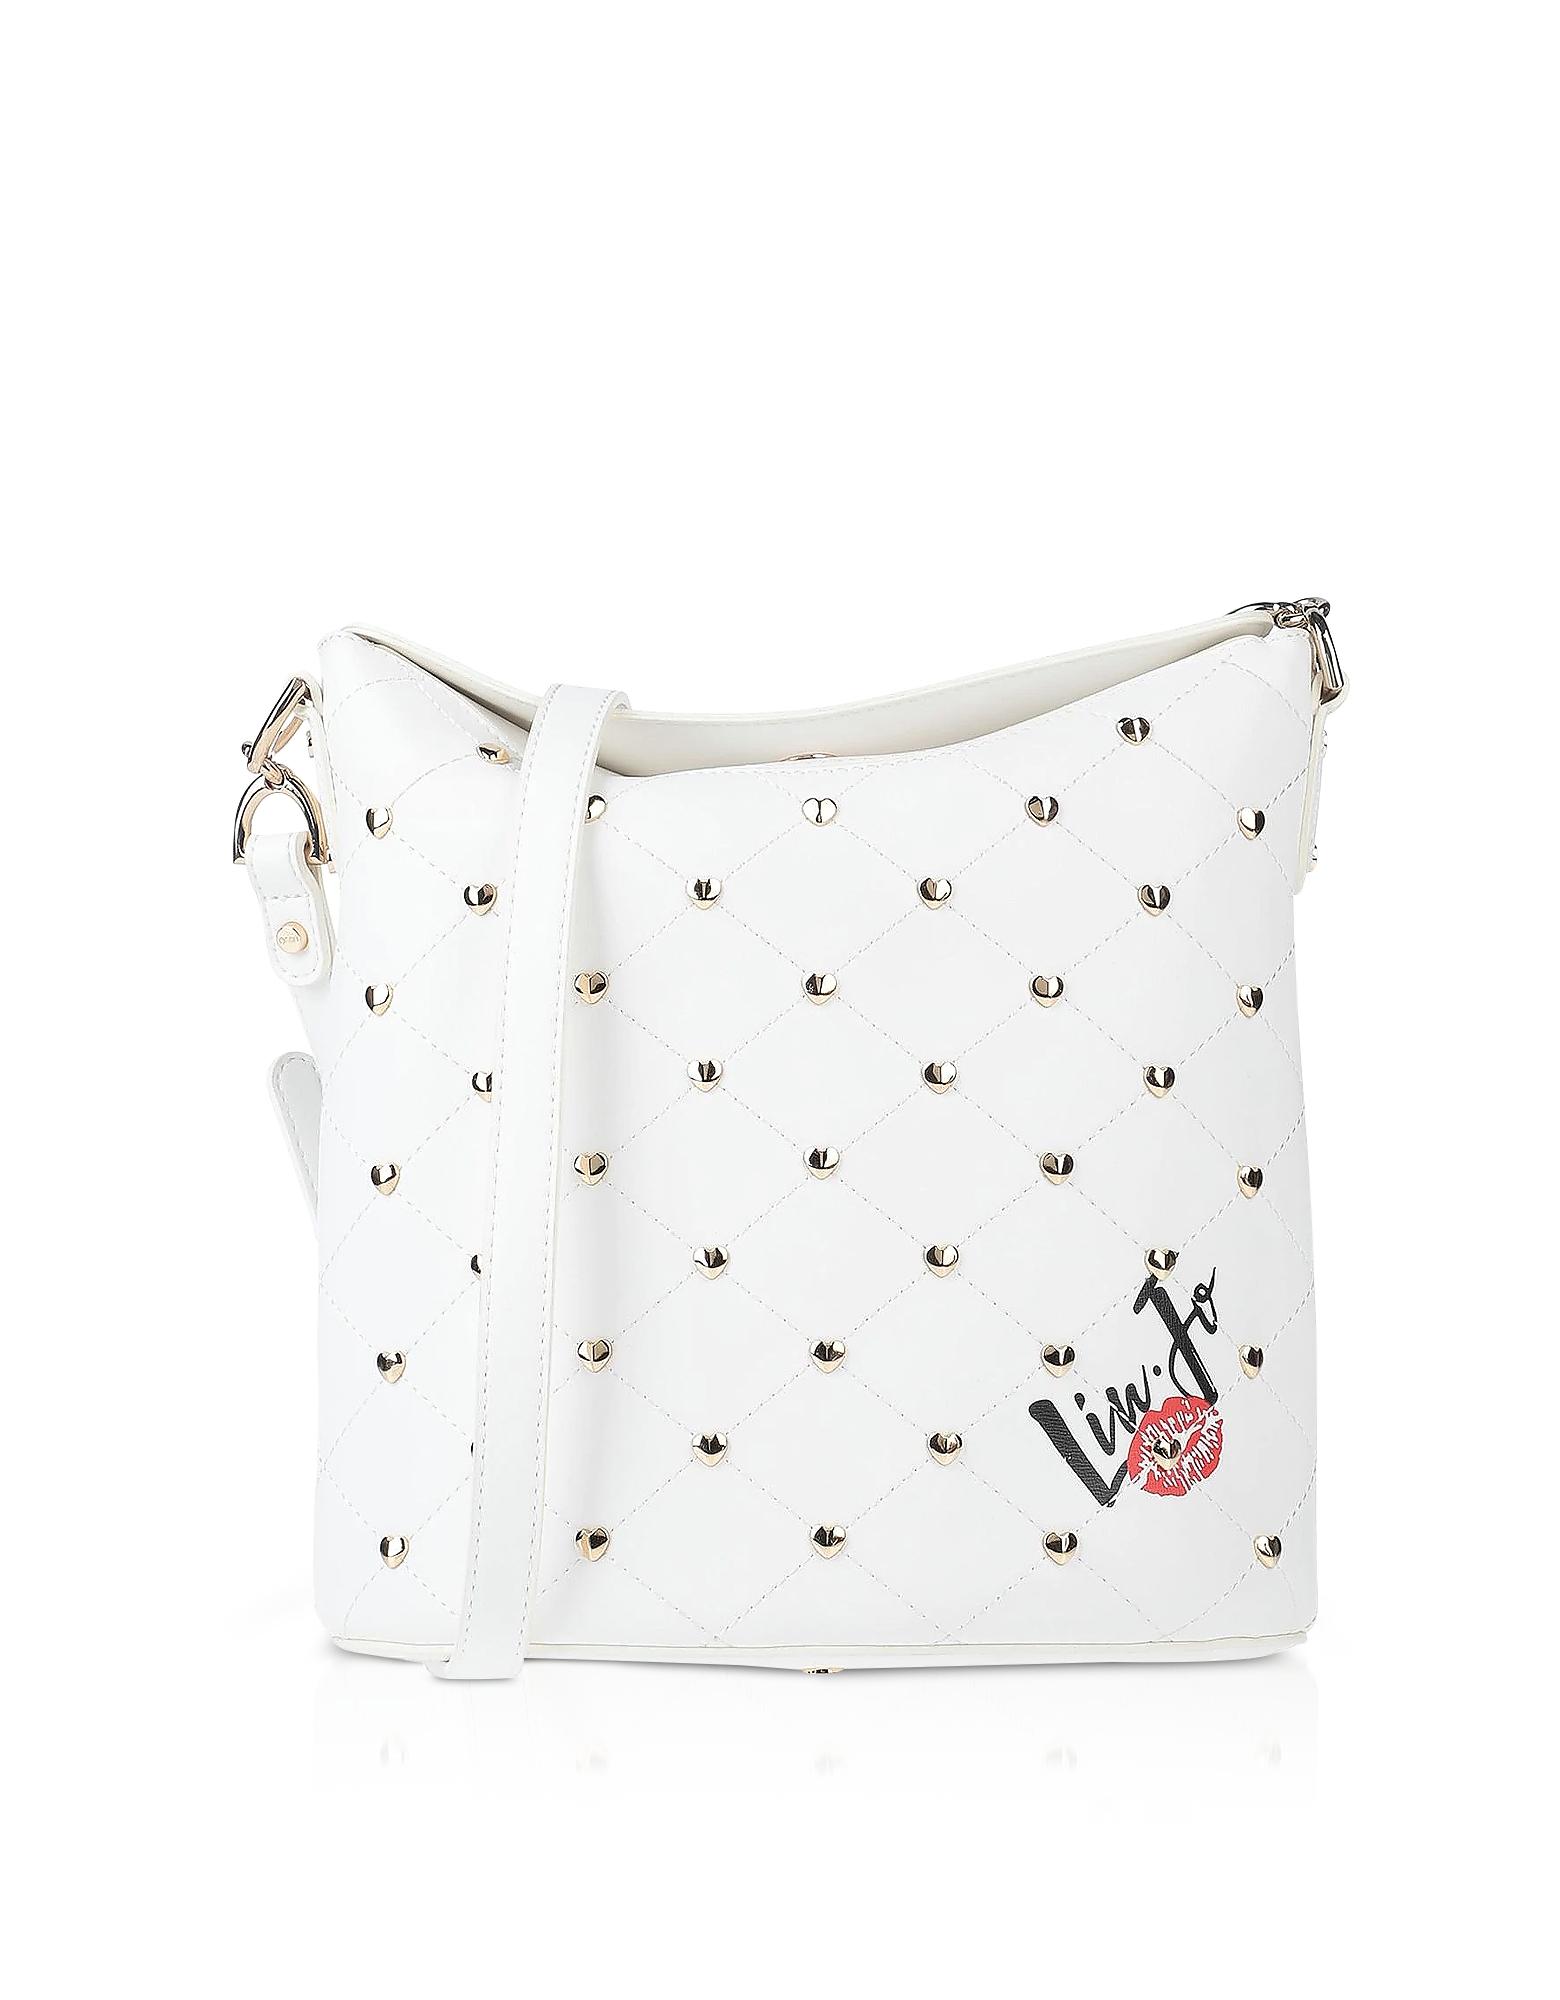 Liu Jo Designer Handbags, Withe Studded Bucket Bag